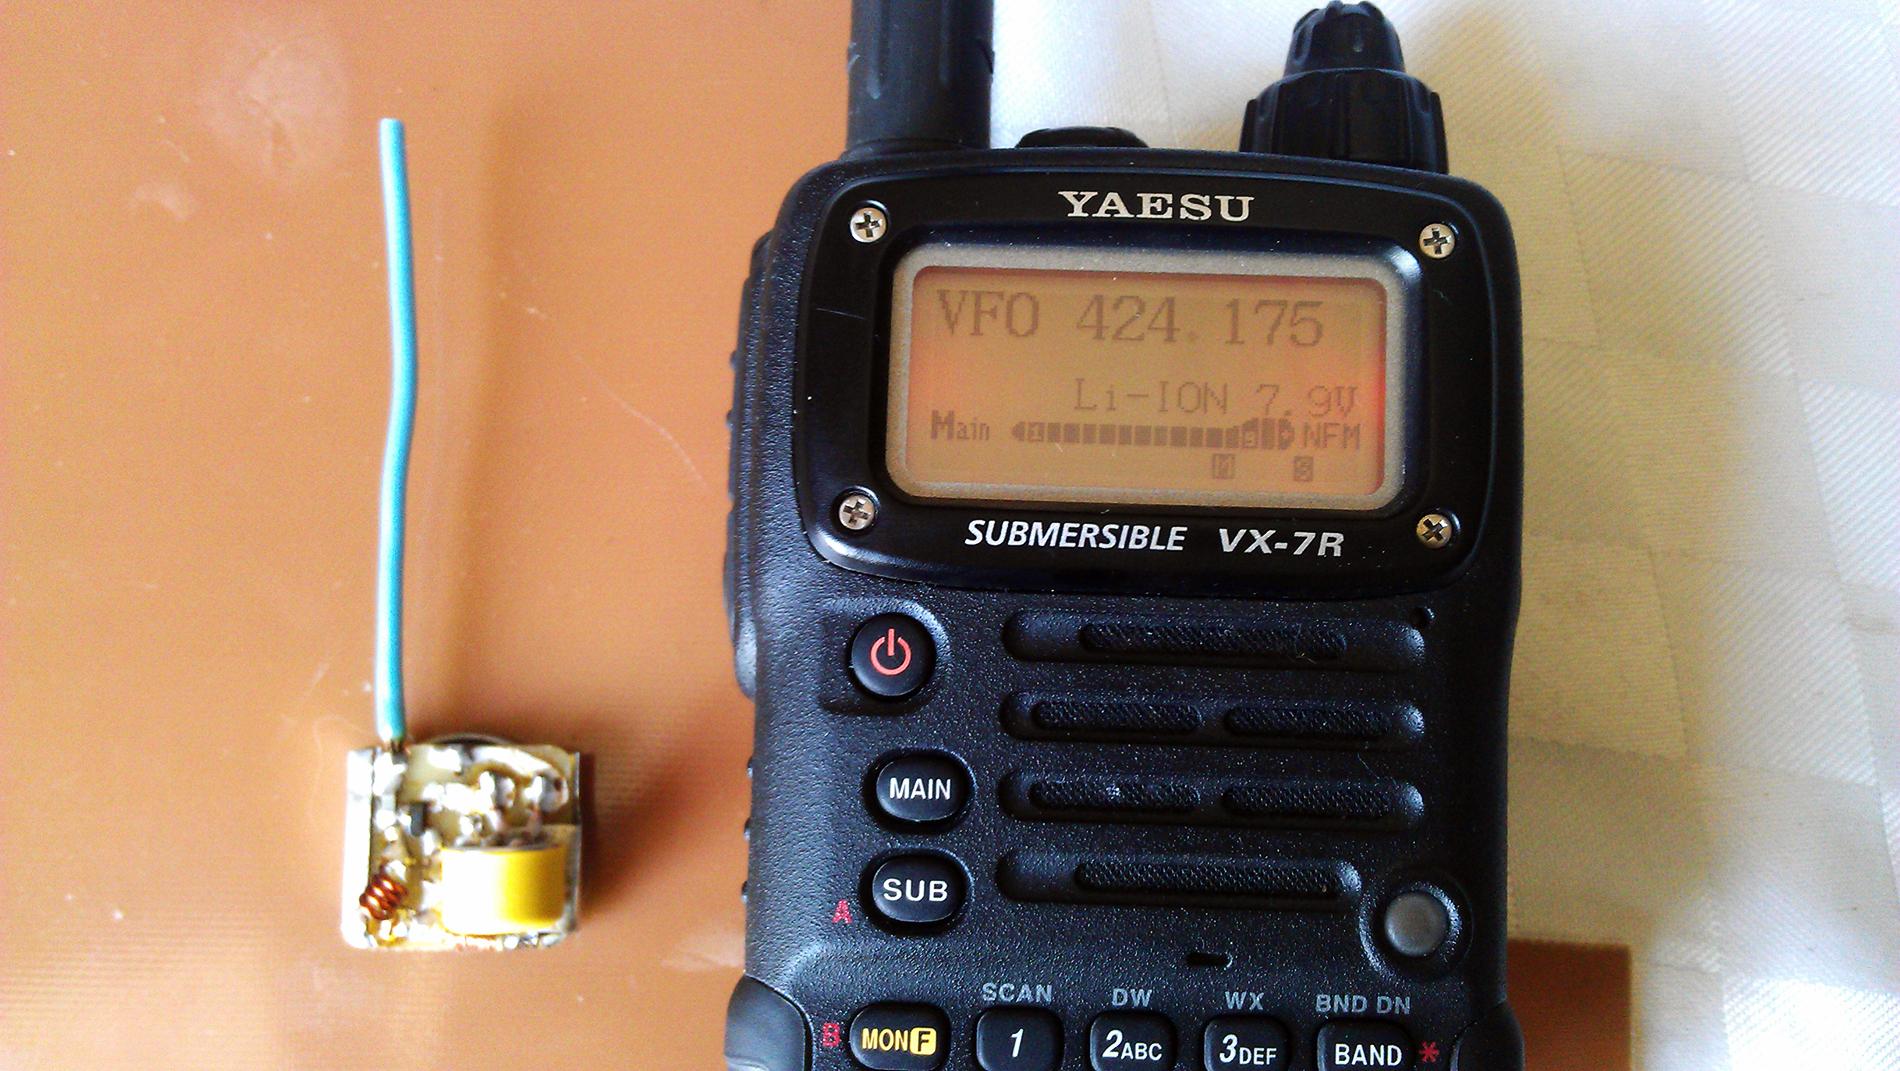 Жучок на 424 МГц